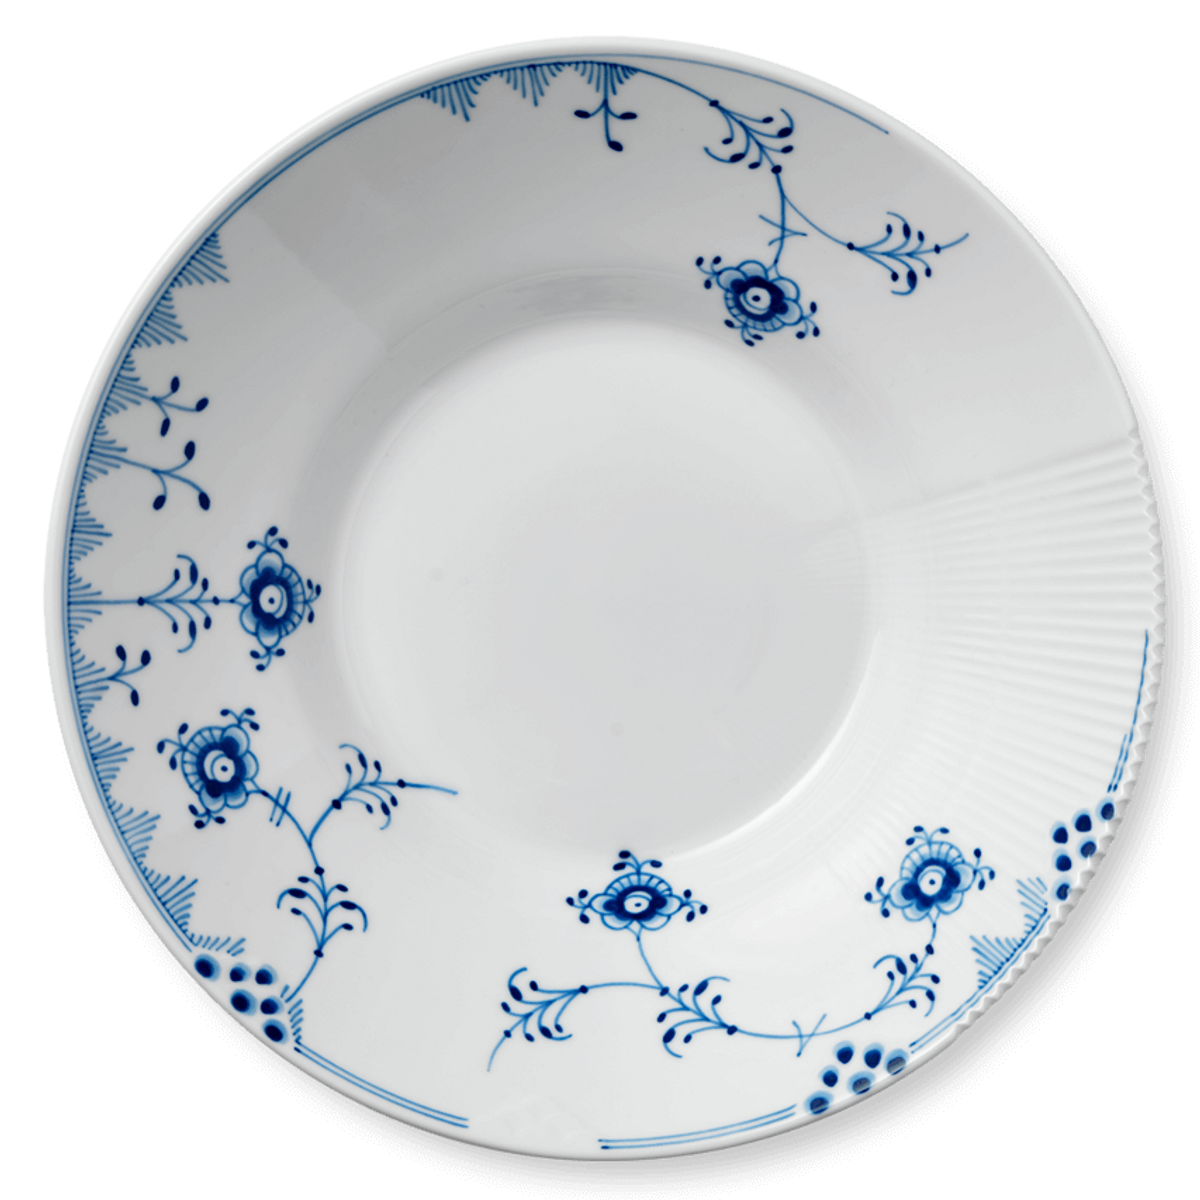 Blå Elements dyp tallerken 25 cm Royal Copenhagen